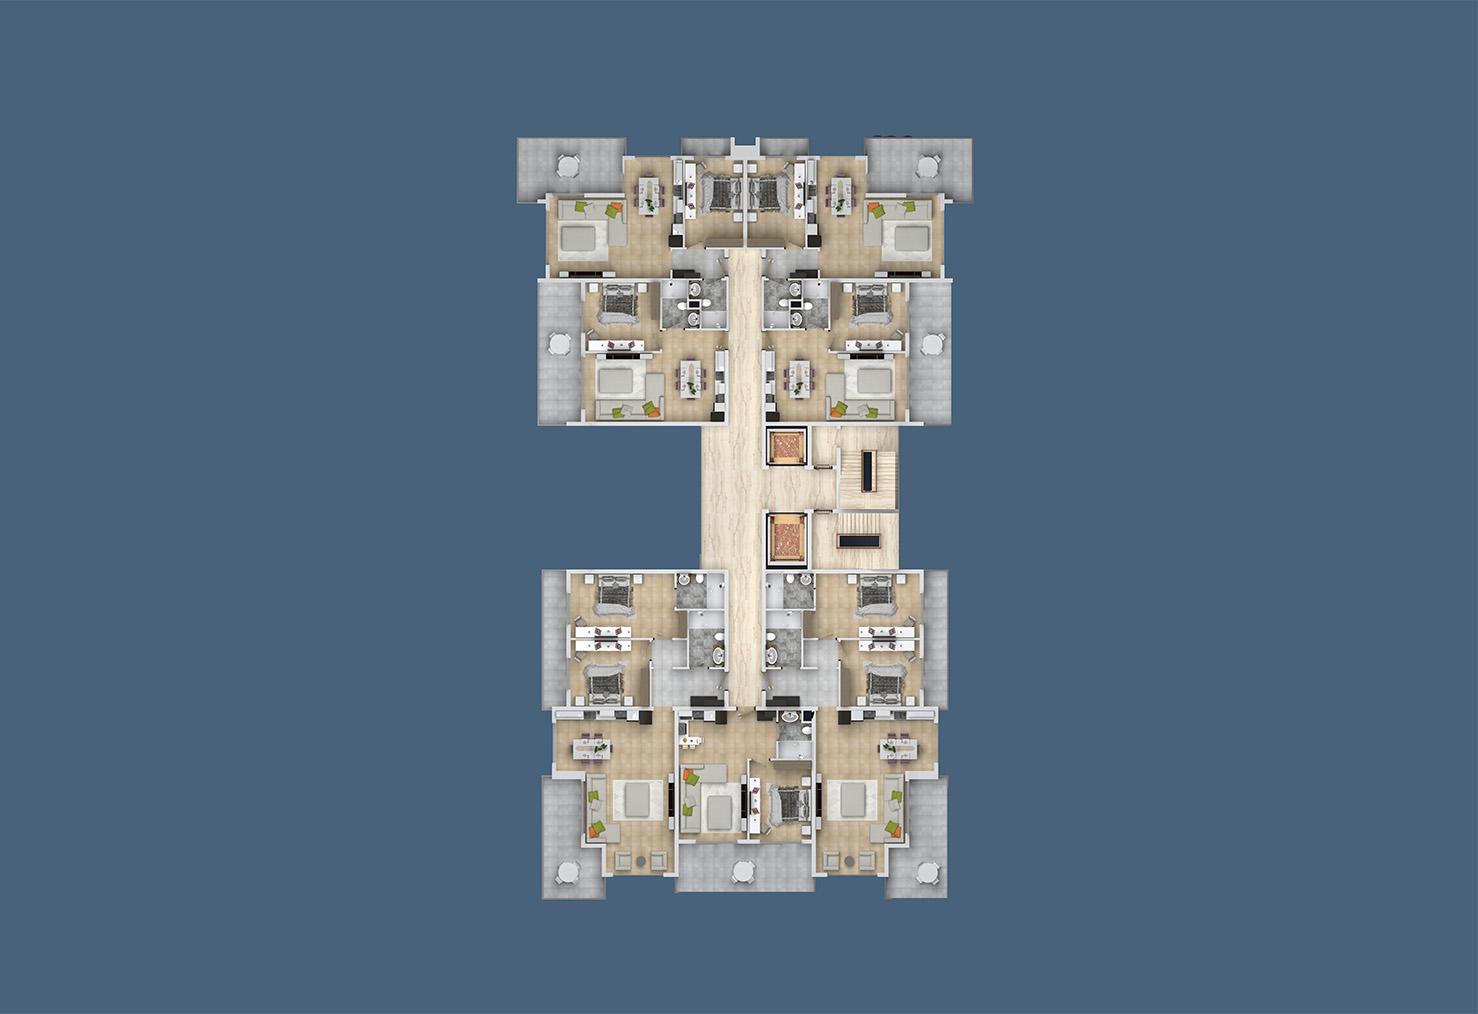 Floor plans of apartments 8 floor «A» Yekta Kingdom Trade Center